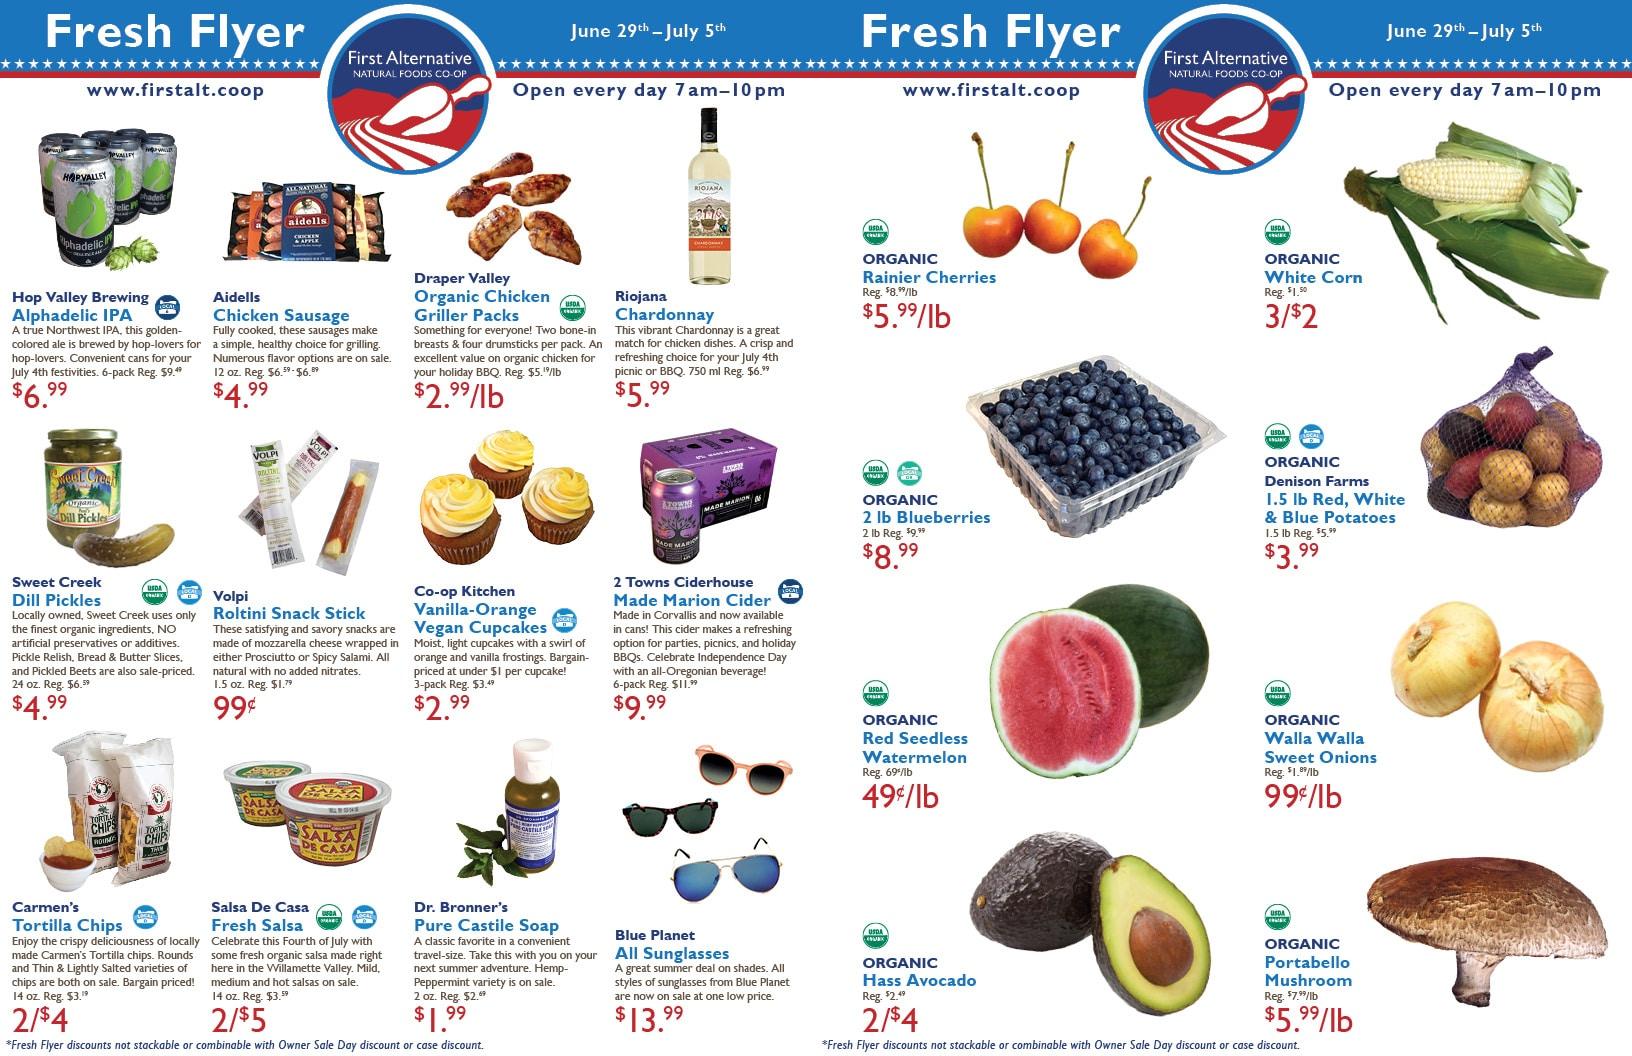 First Alternative Fresh Flyer June 29-July 5